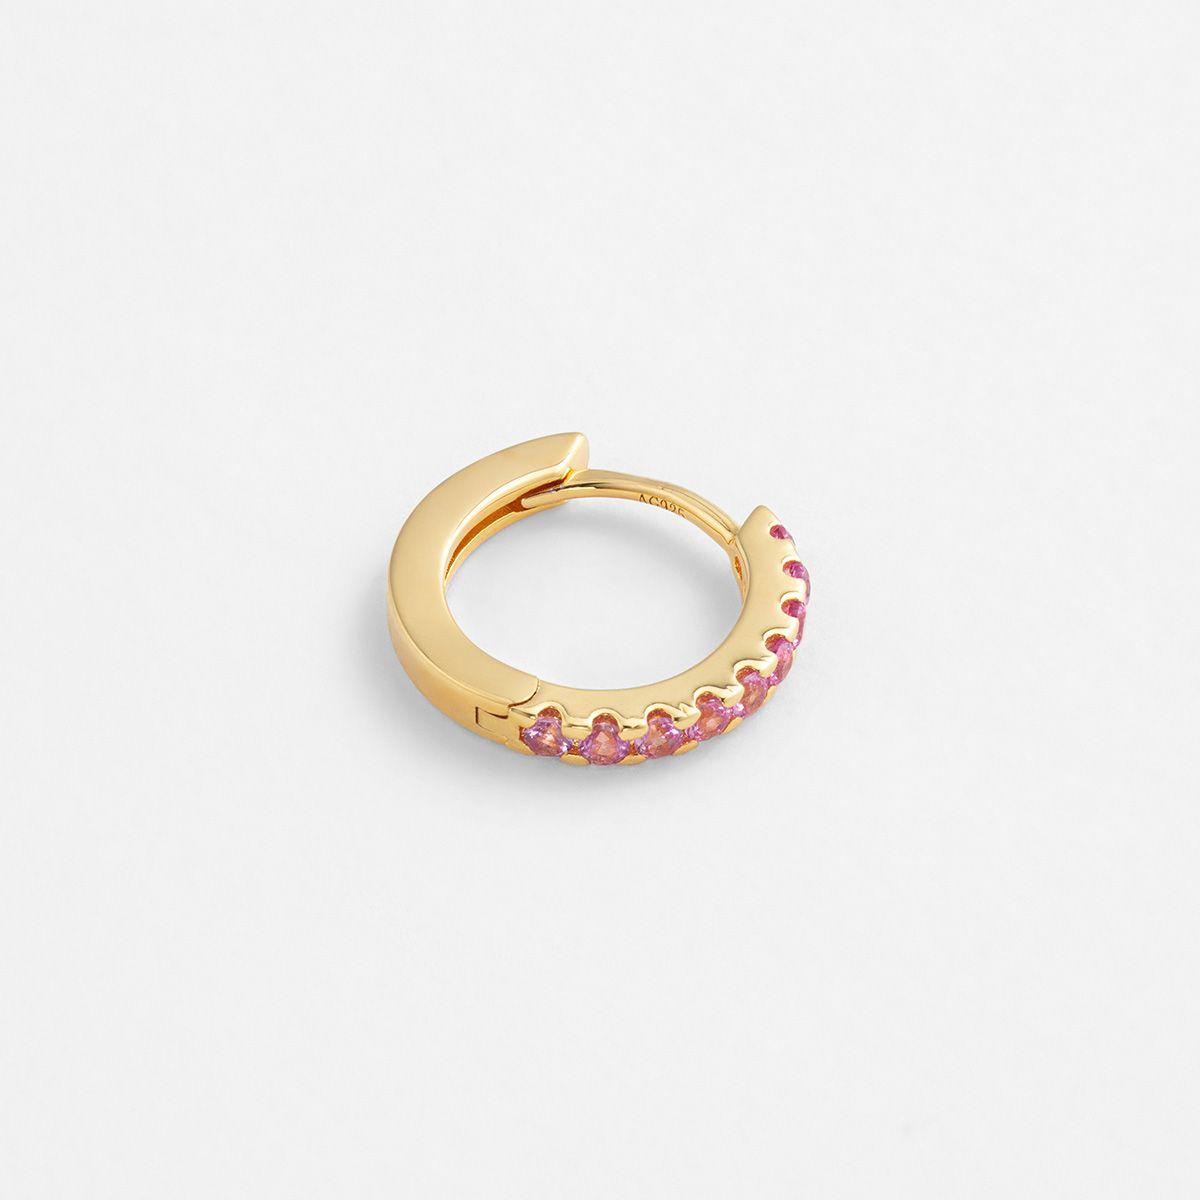 Kylee Pink - Single-Ohrringe - 18k vergoldet